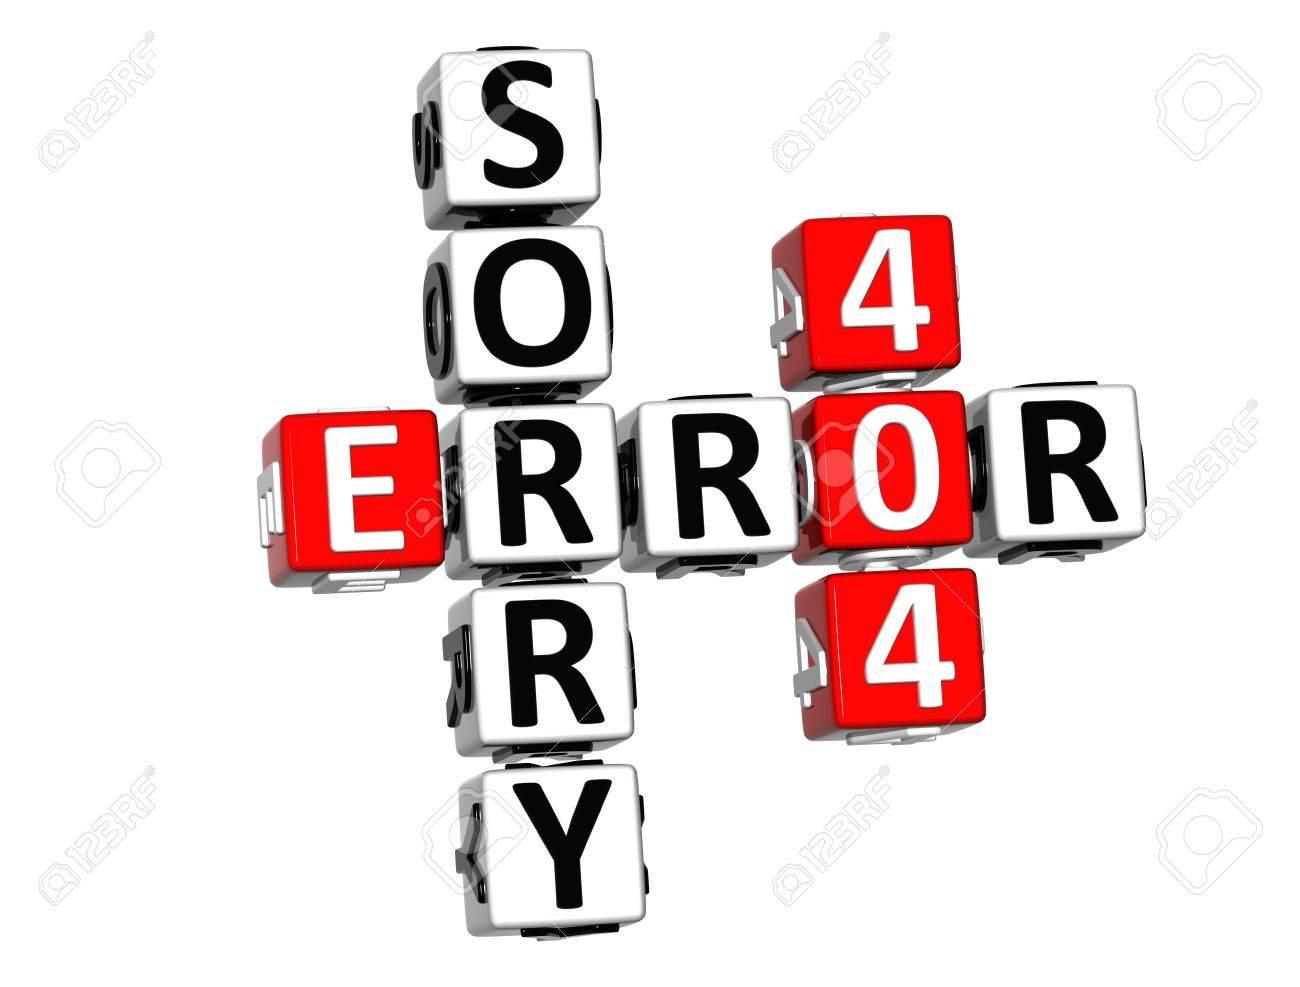 Background image 404 - 3d Error 404 Sorry Crossword On White Background Stock Photo 13700791